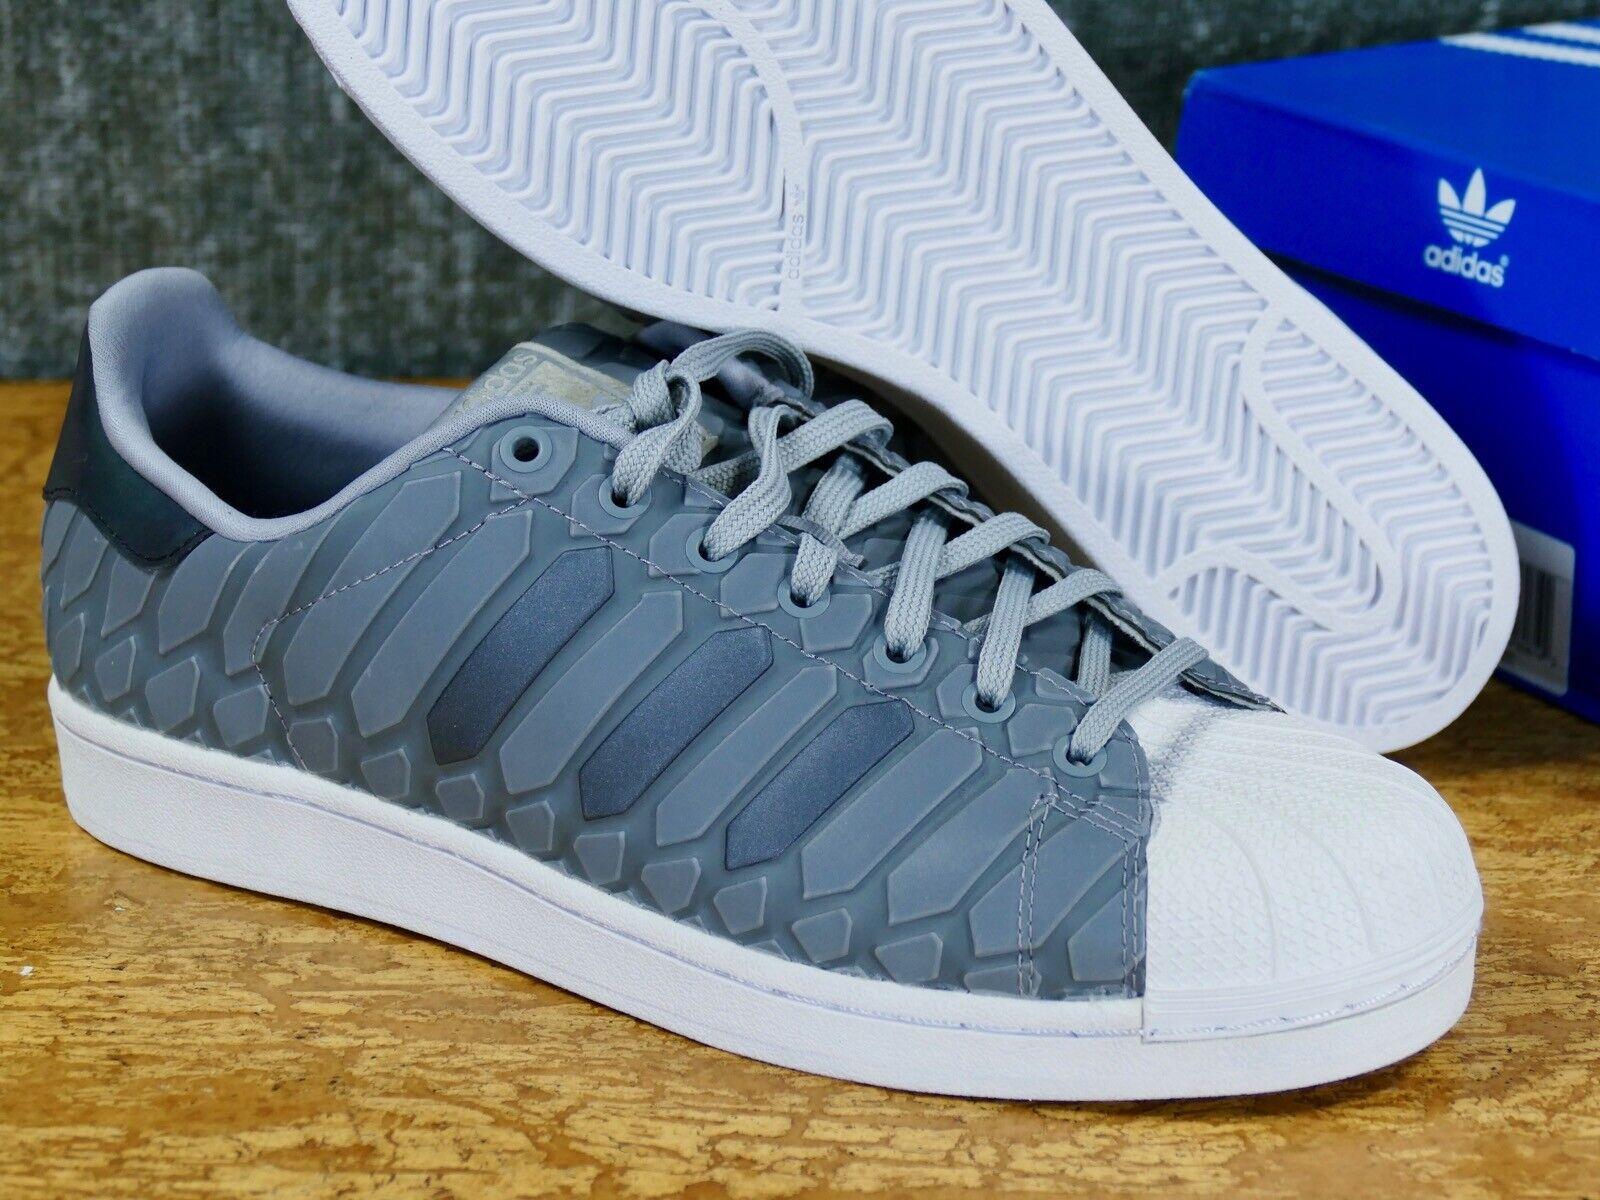 adidas Superstar XENO Light Onyx Grey 3m Reflective Snakeskin Size 12